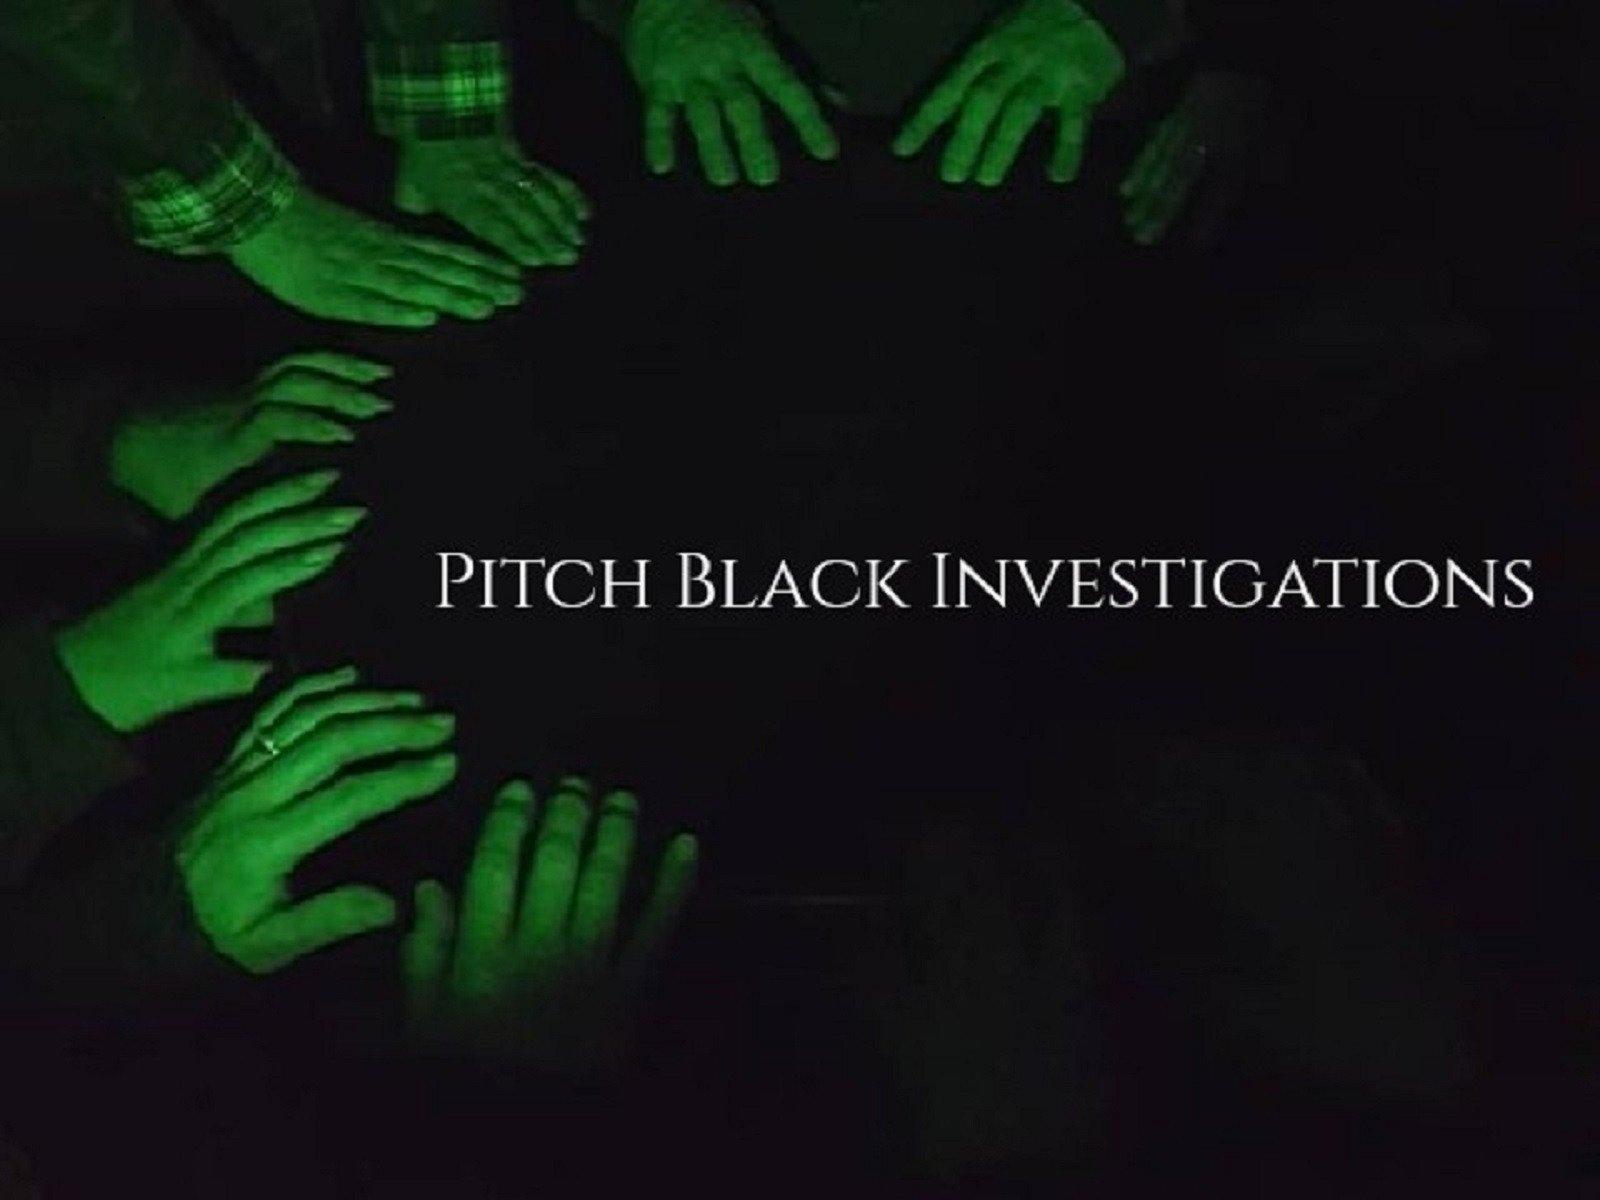 Pitch Black Investigations